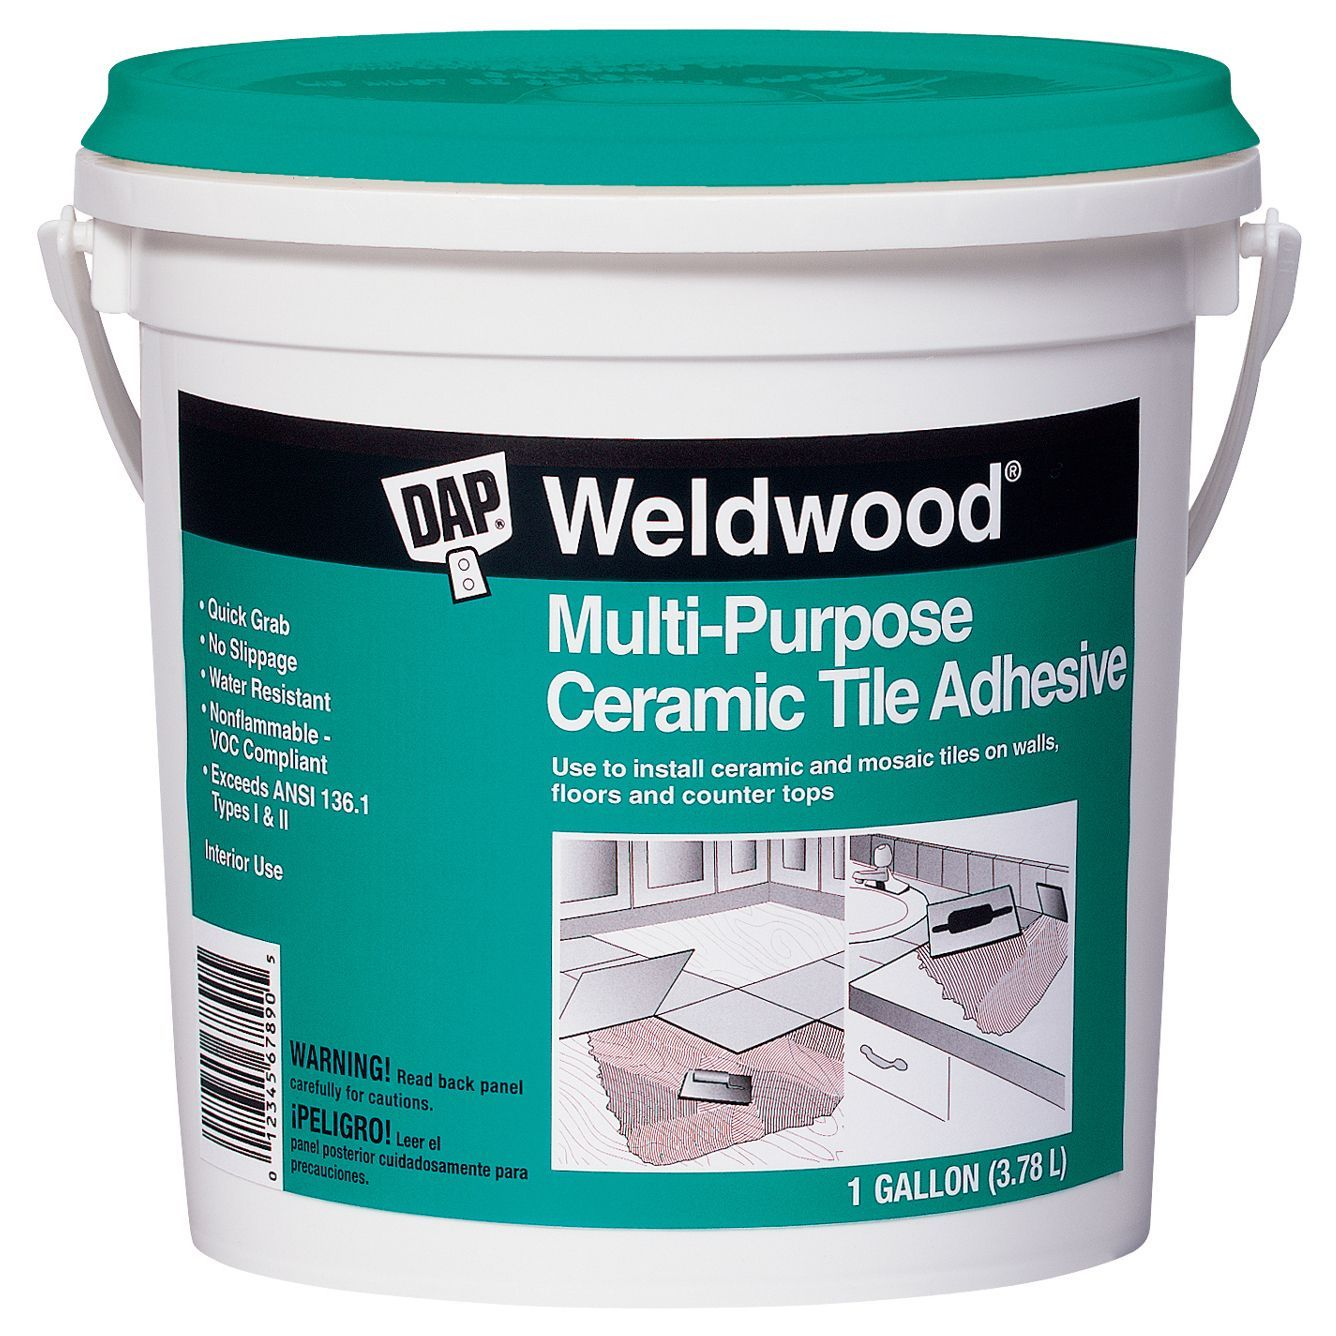 Dap 25192 1 gallon weldwood multipurpose ceramic tile adhesive dap 25192 1 gallon weldwood multipurpose ceramic tile adhesive dailygadgetfo Choice Image